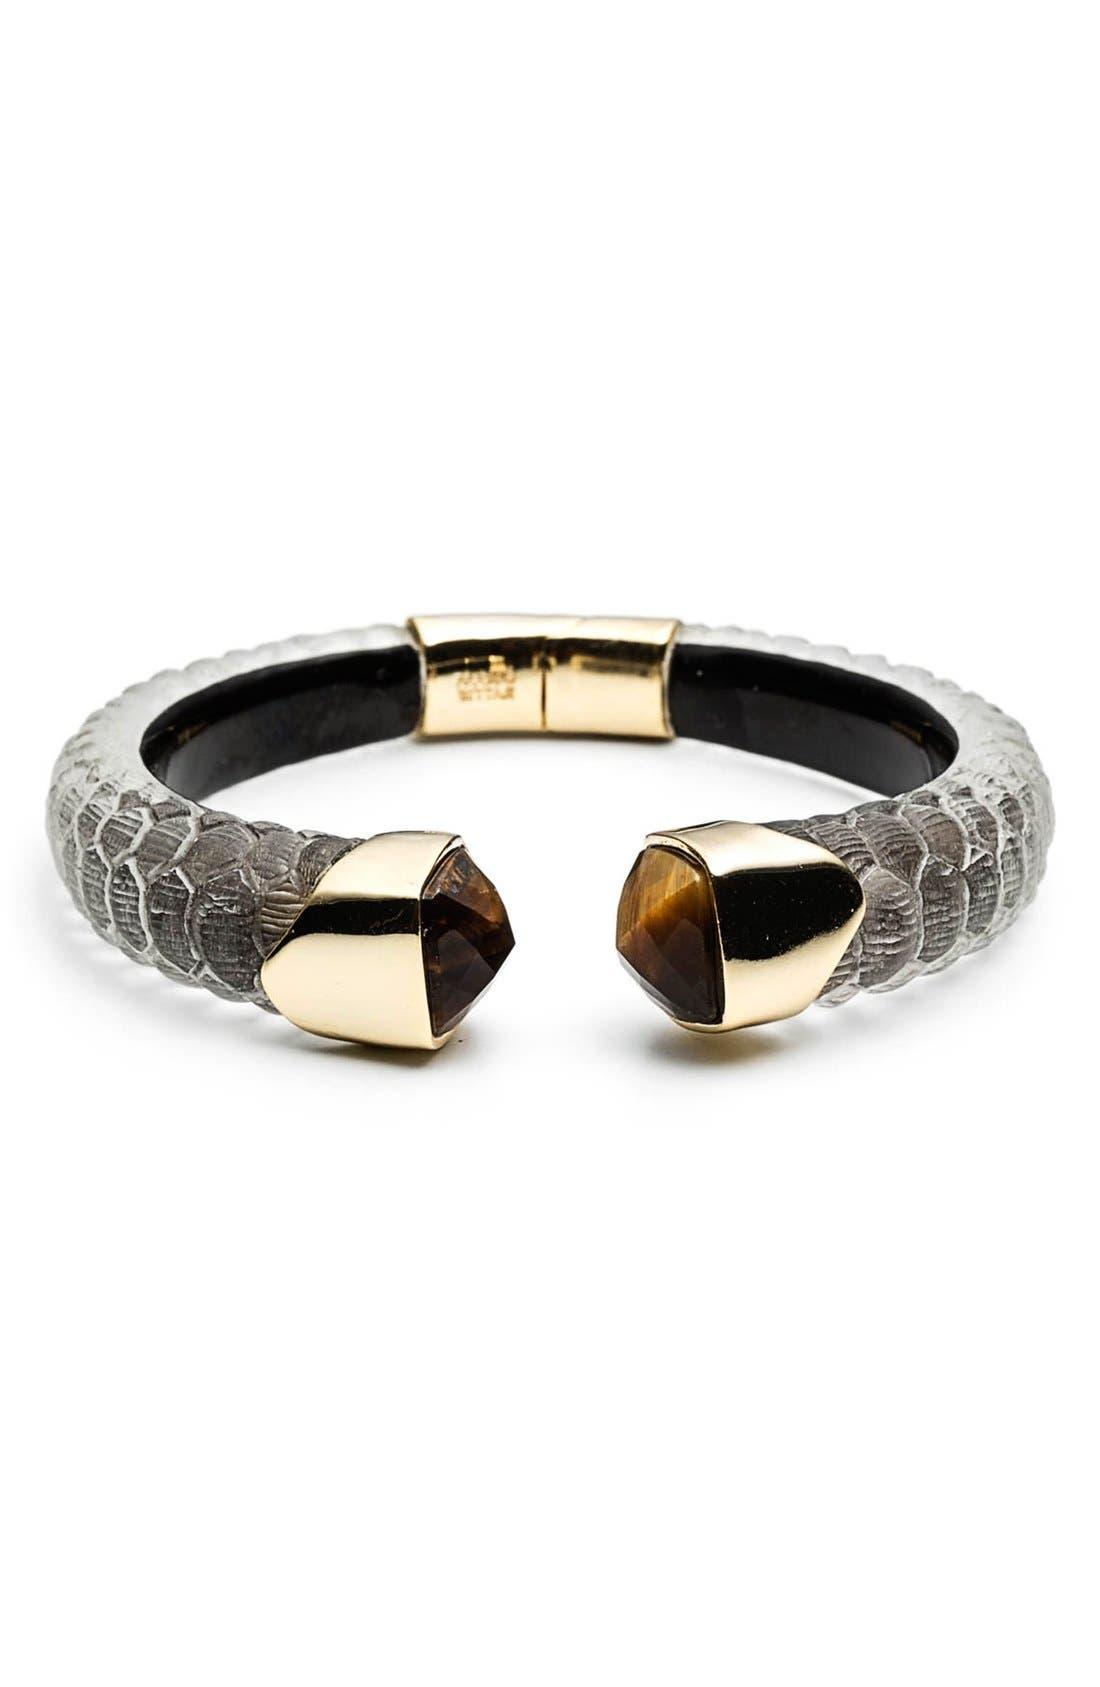 Main Image - Alexis Bittar 'Lucite® - Crocodile' Hinged Bracelet